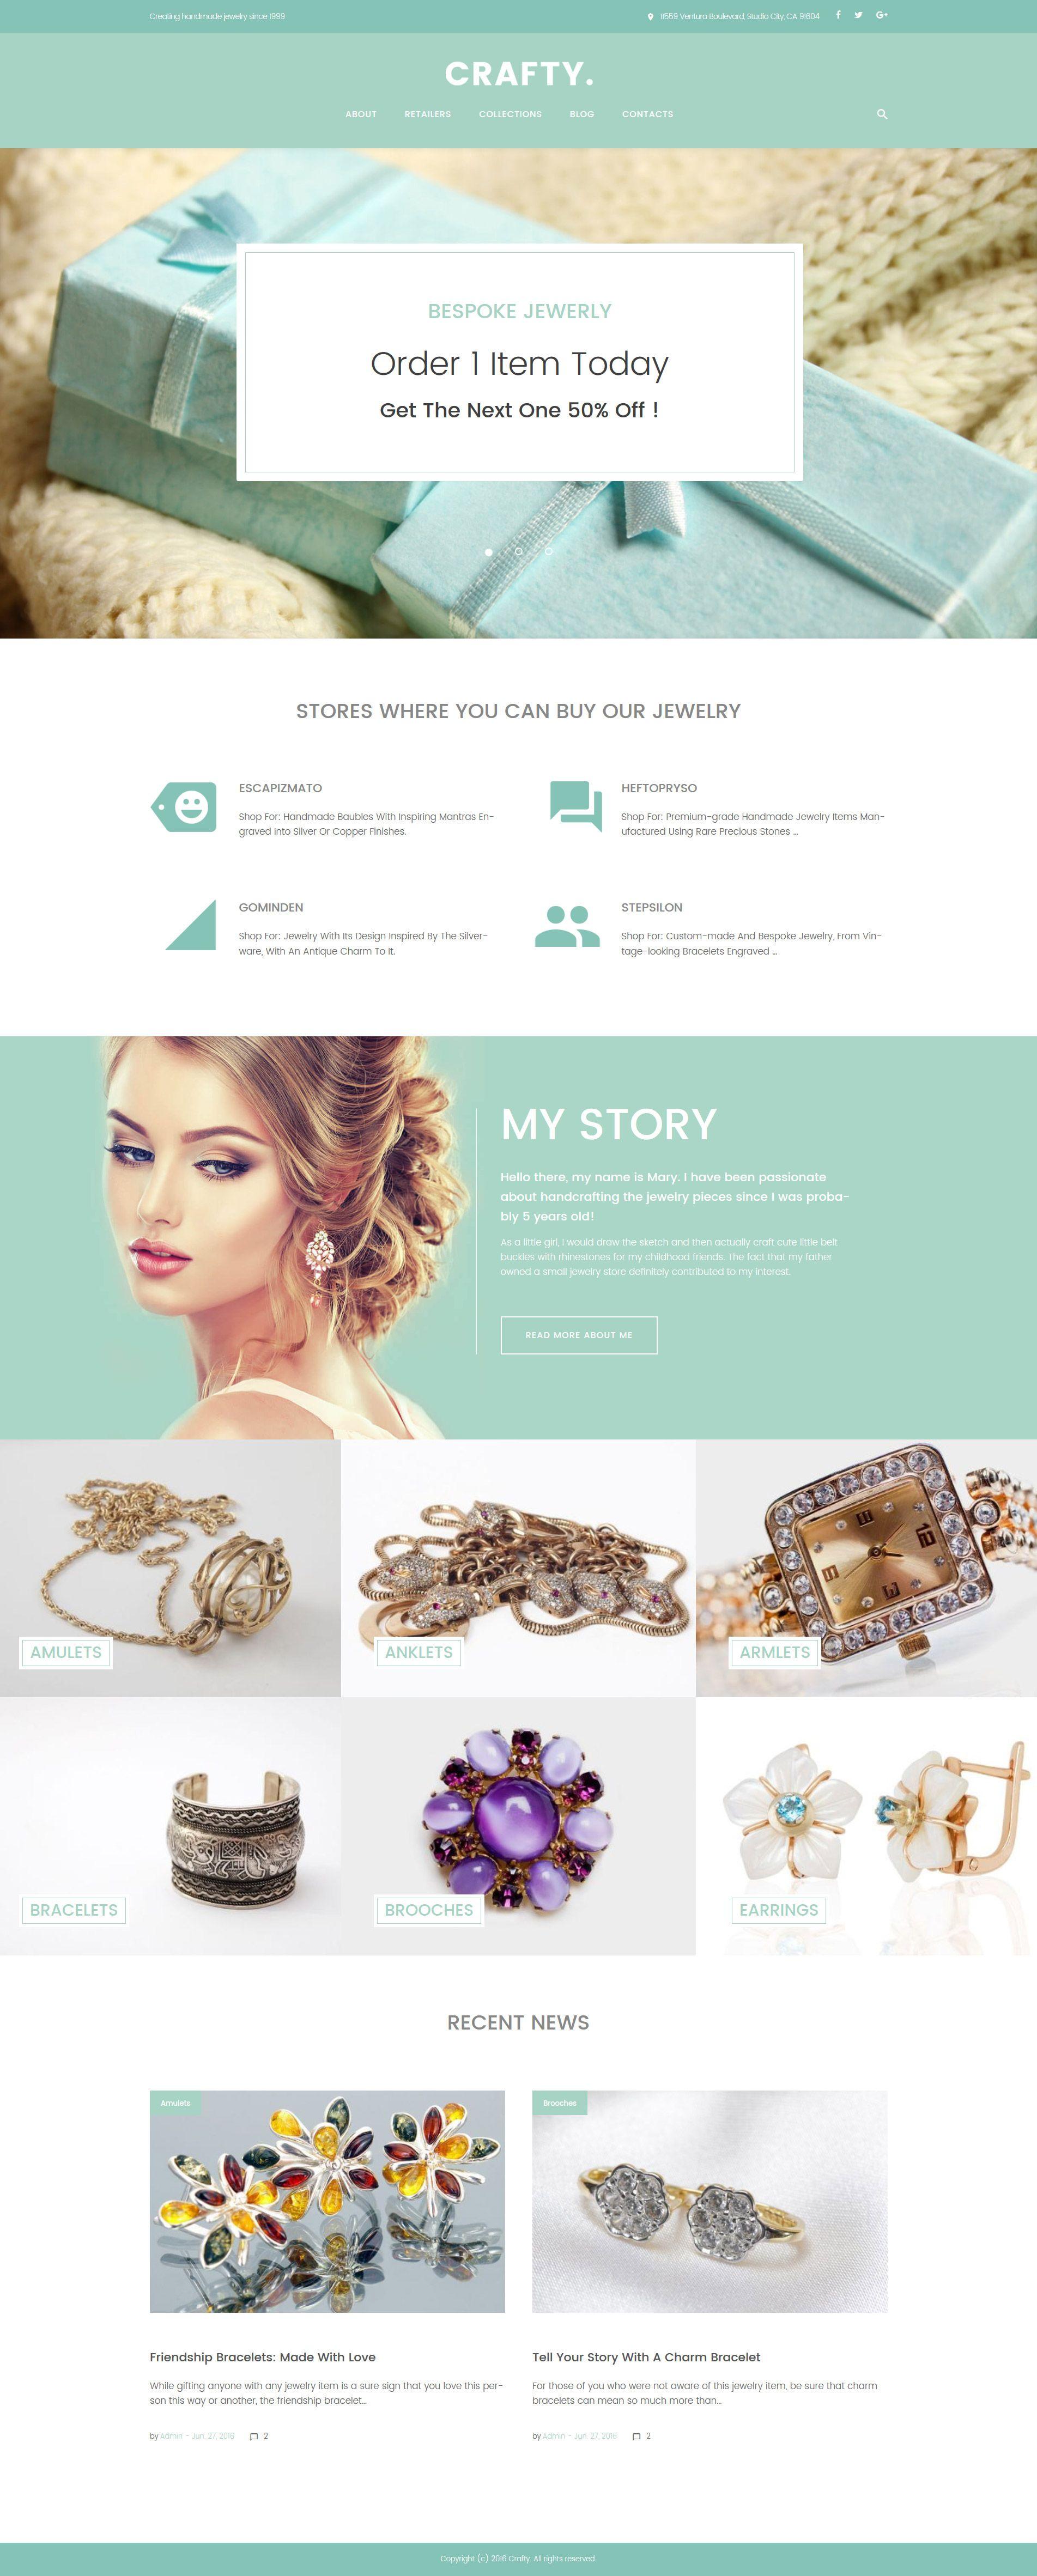 Crafty handmade jewelry artist wordpress theme layout